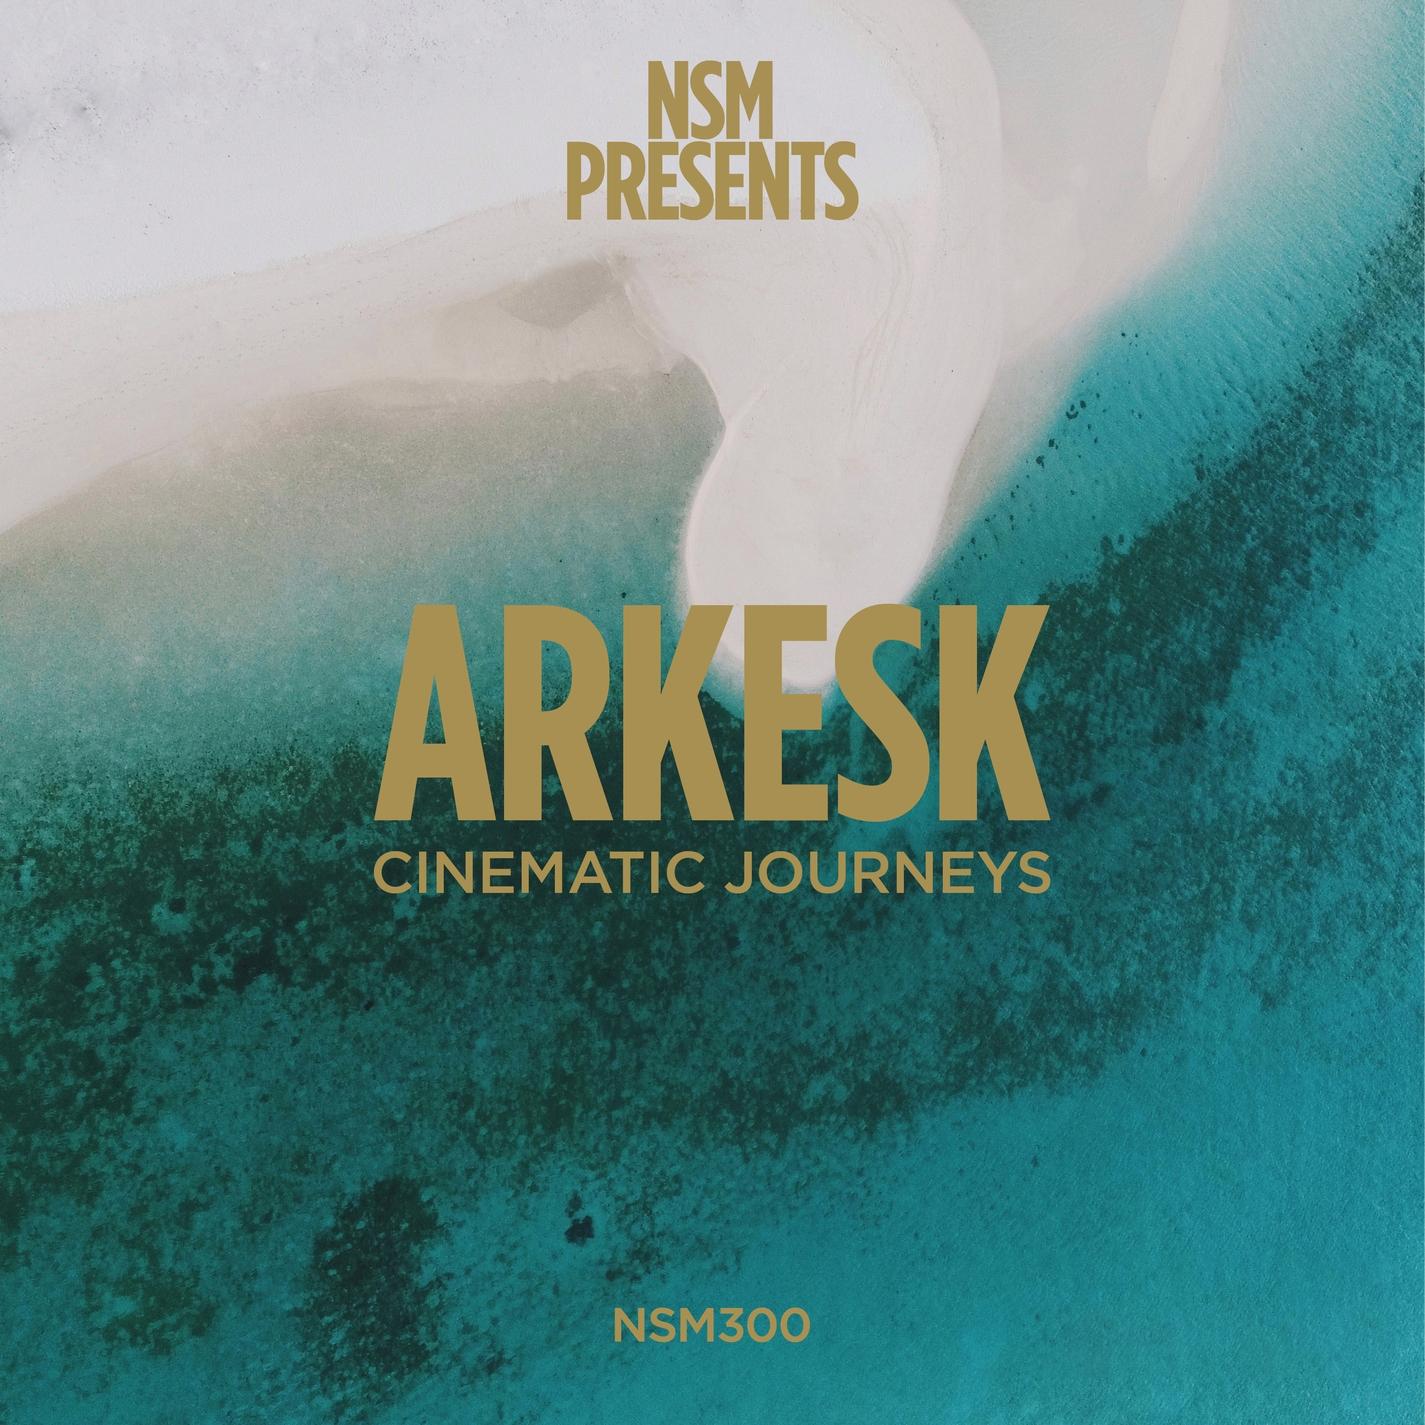 NSM Presents: ARKESK